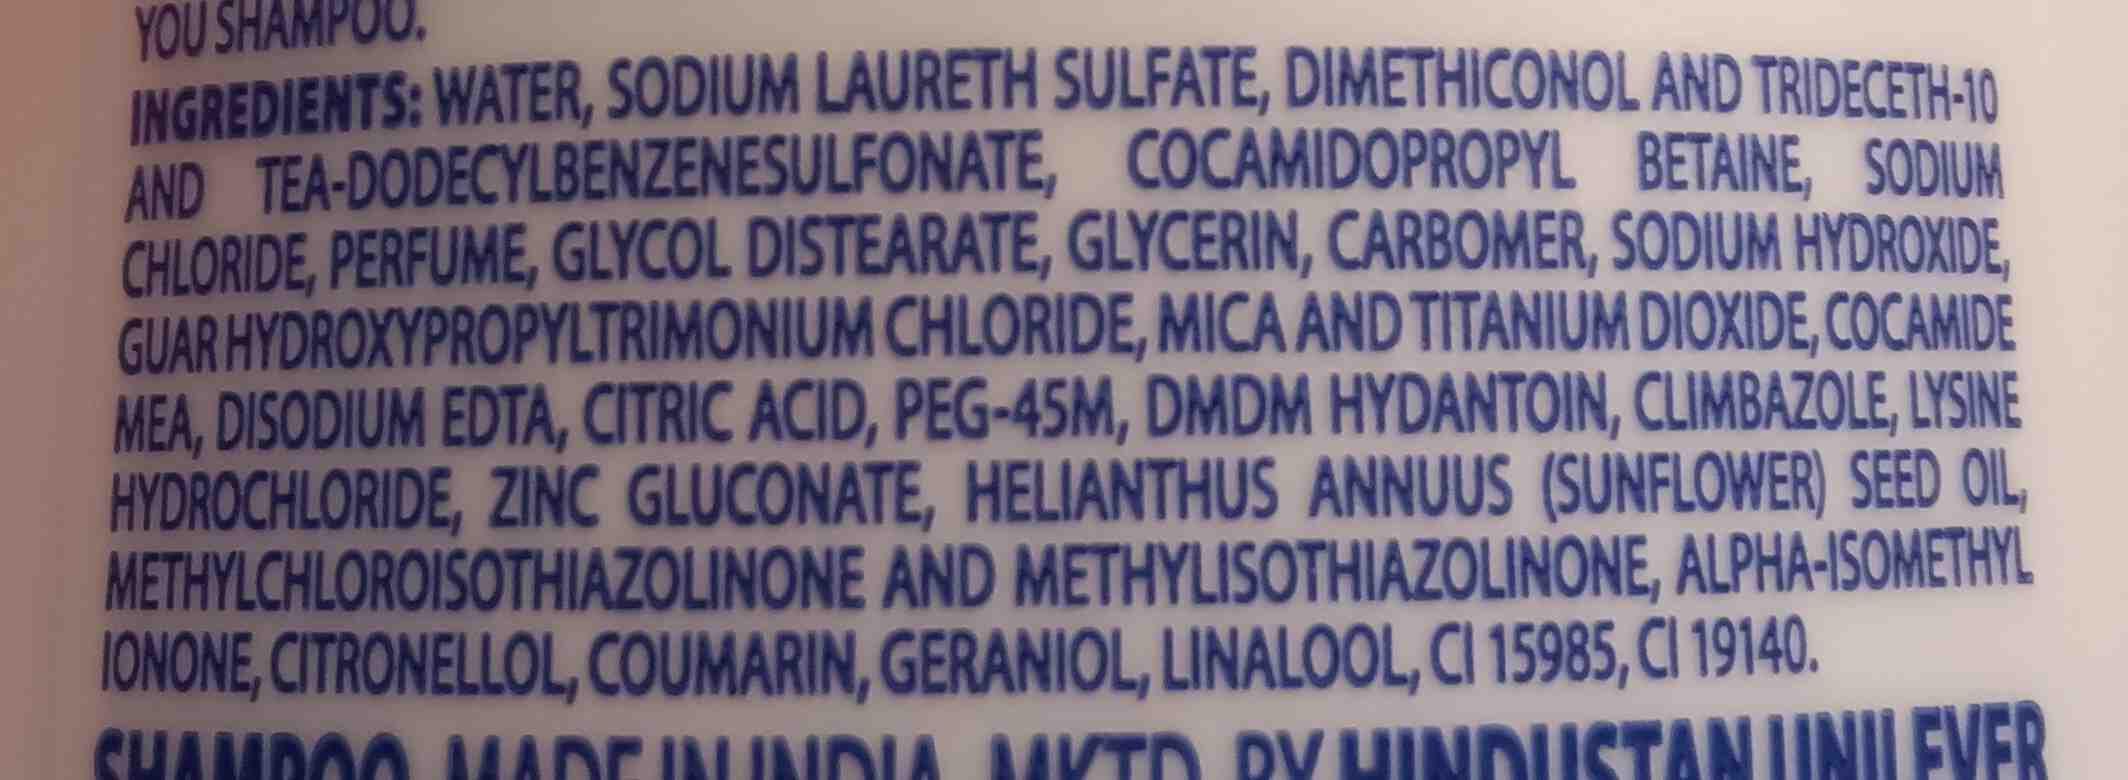 Dove shampoo - Ingredients - en